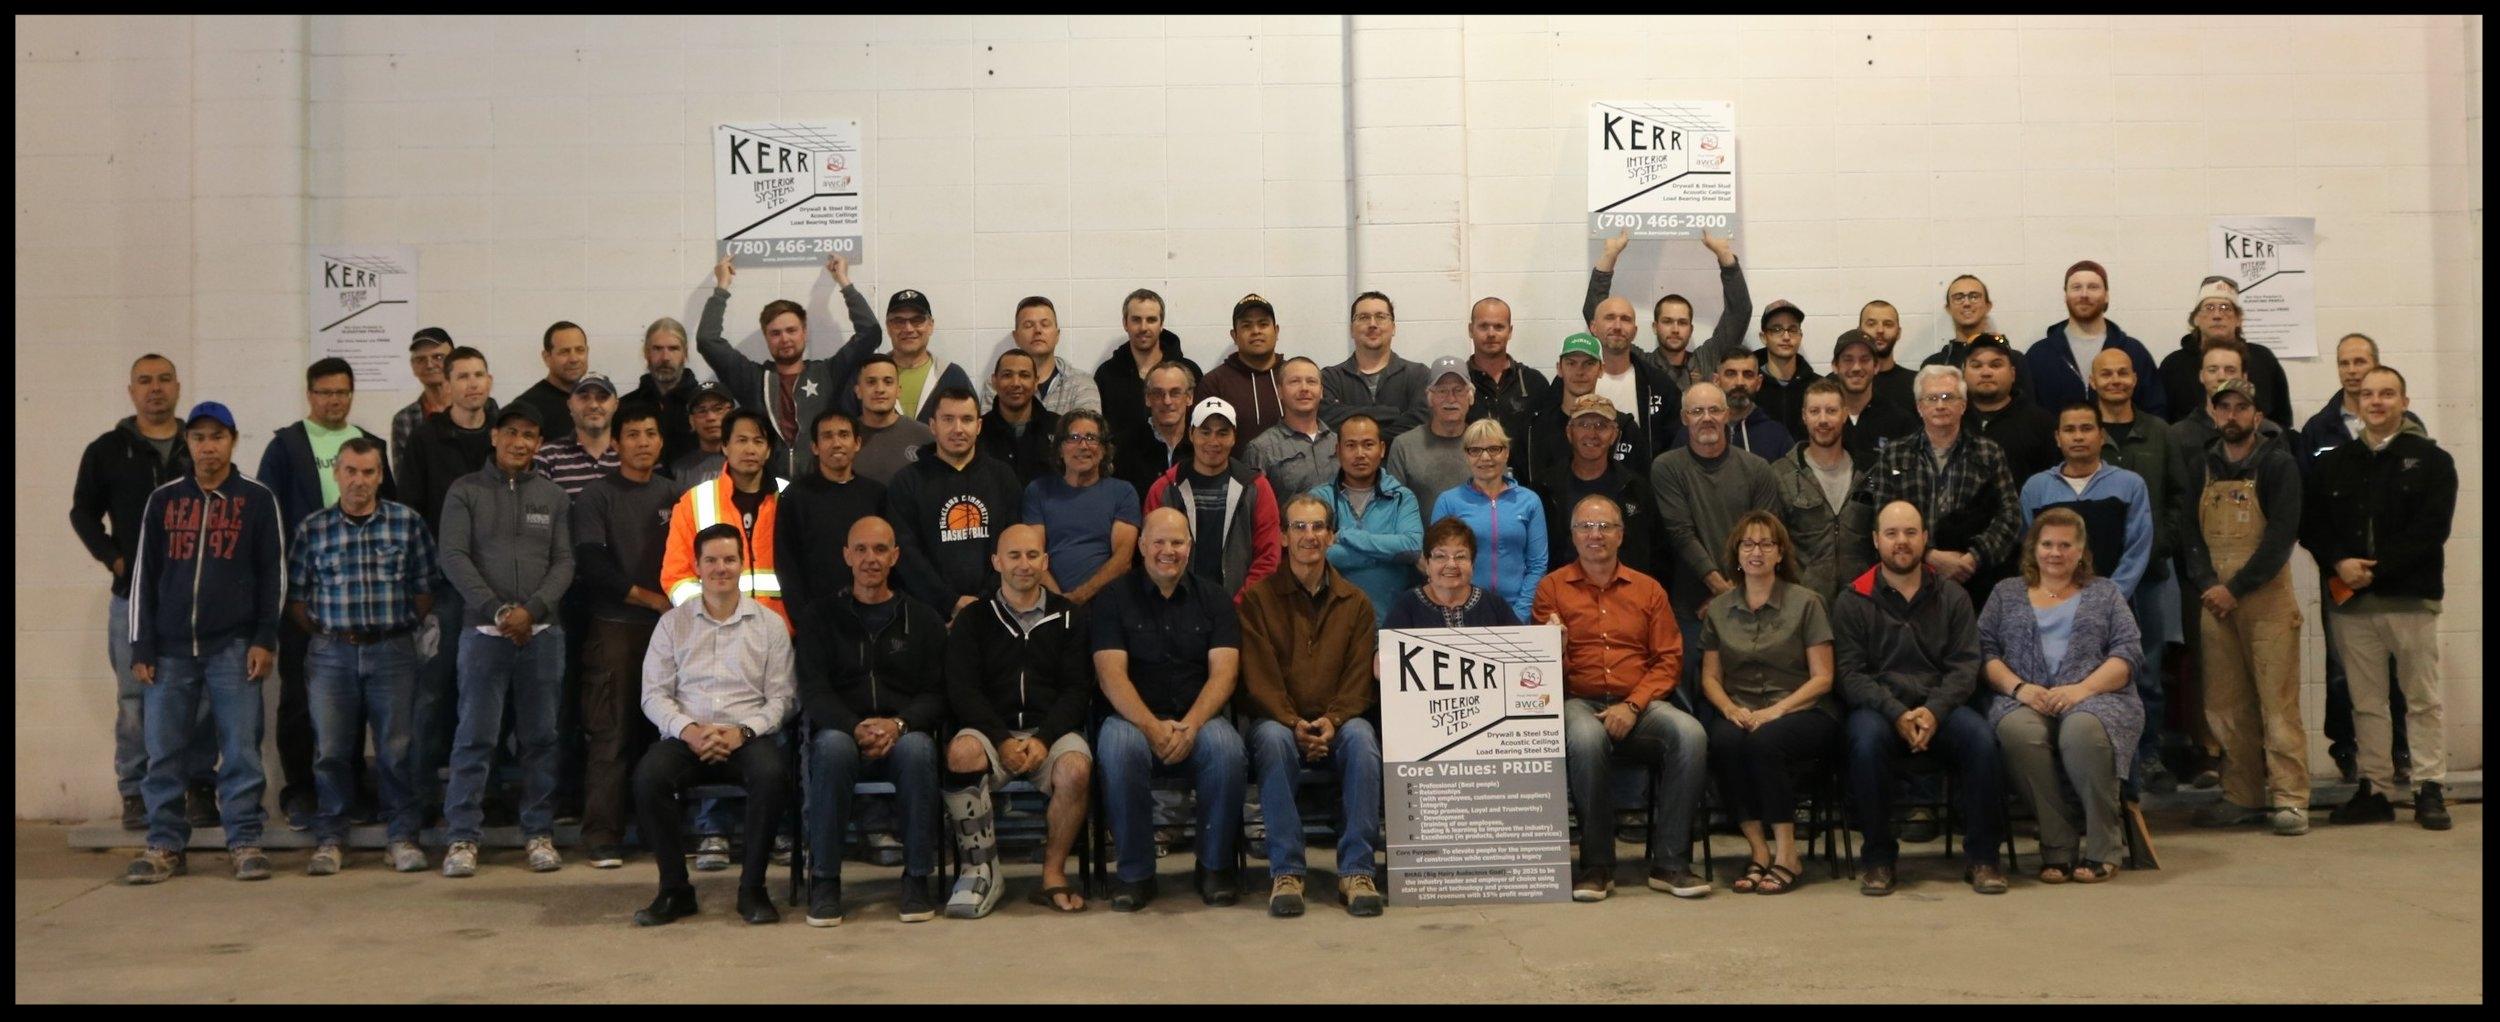 Safety Breakfast June 5, 2018- The KERR Team